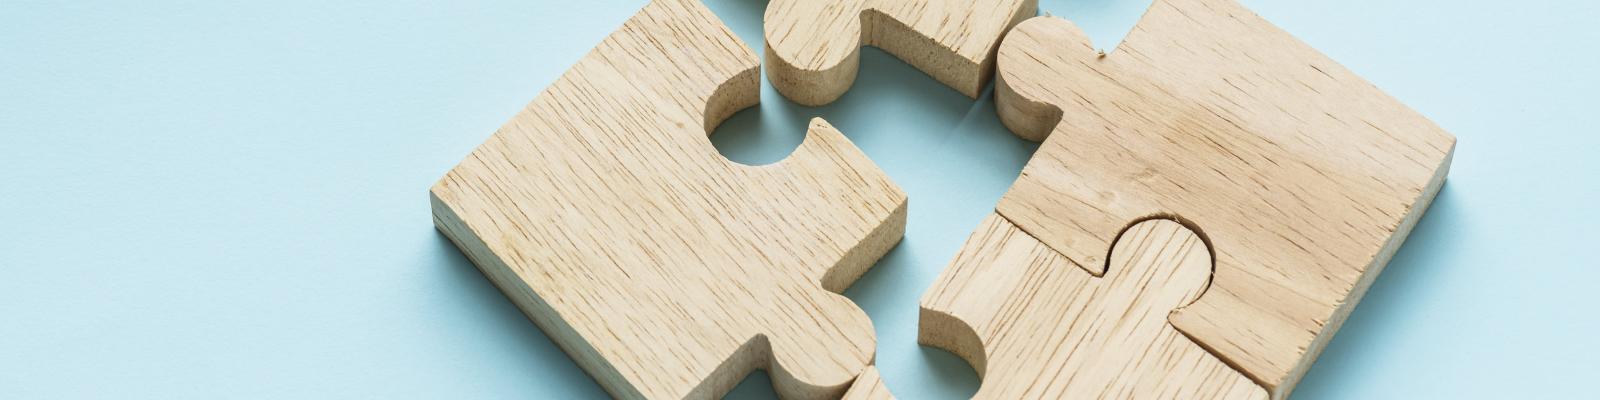 Modules 1, 2, 3: Financiële opleiding